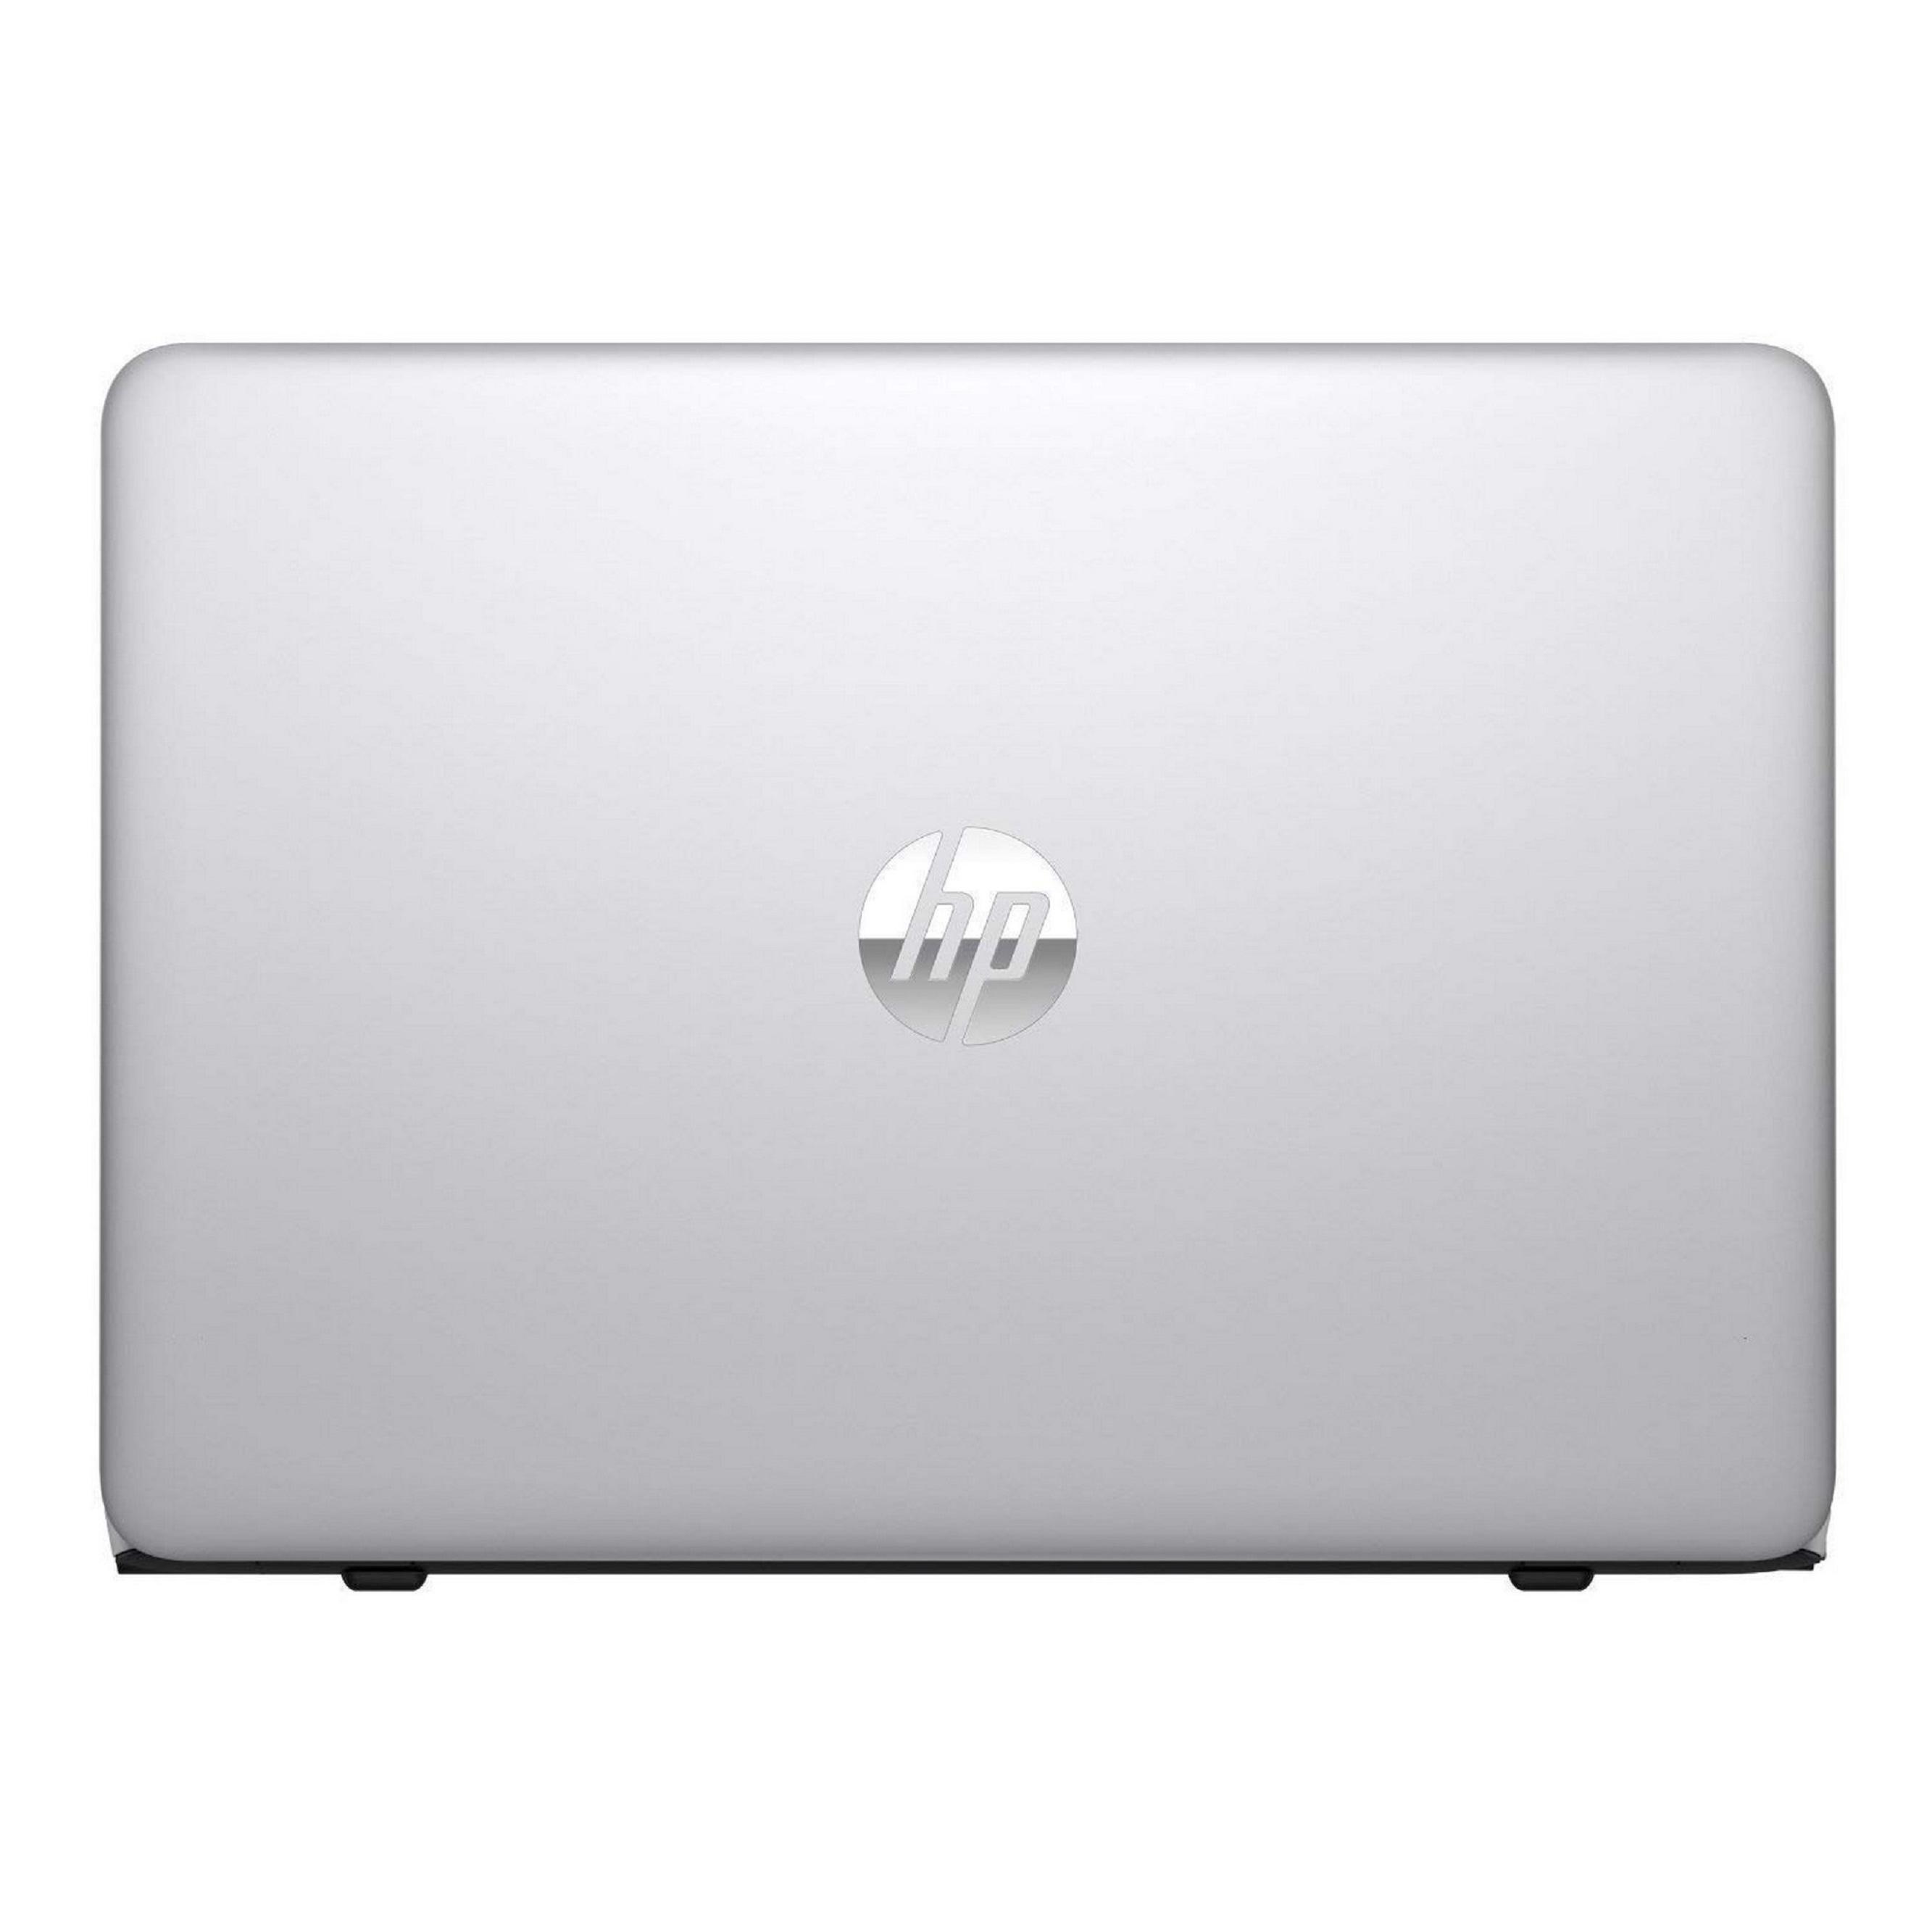 Hp EliteBook 840 G3 14-inch (2015) - Core i7-6600U - 16 GB - SSD 512 GB